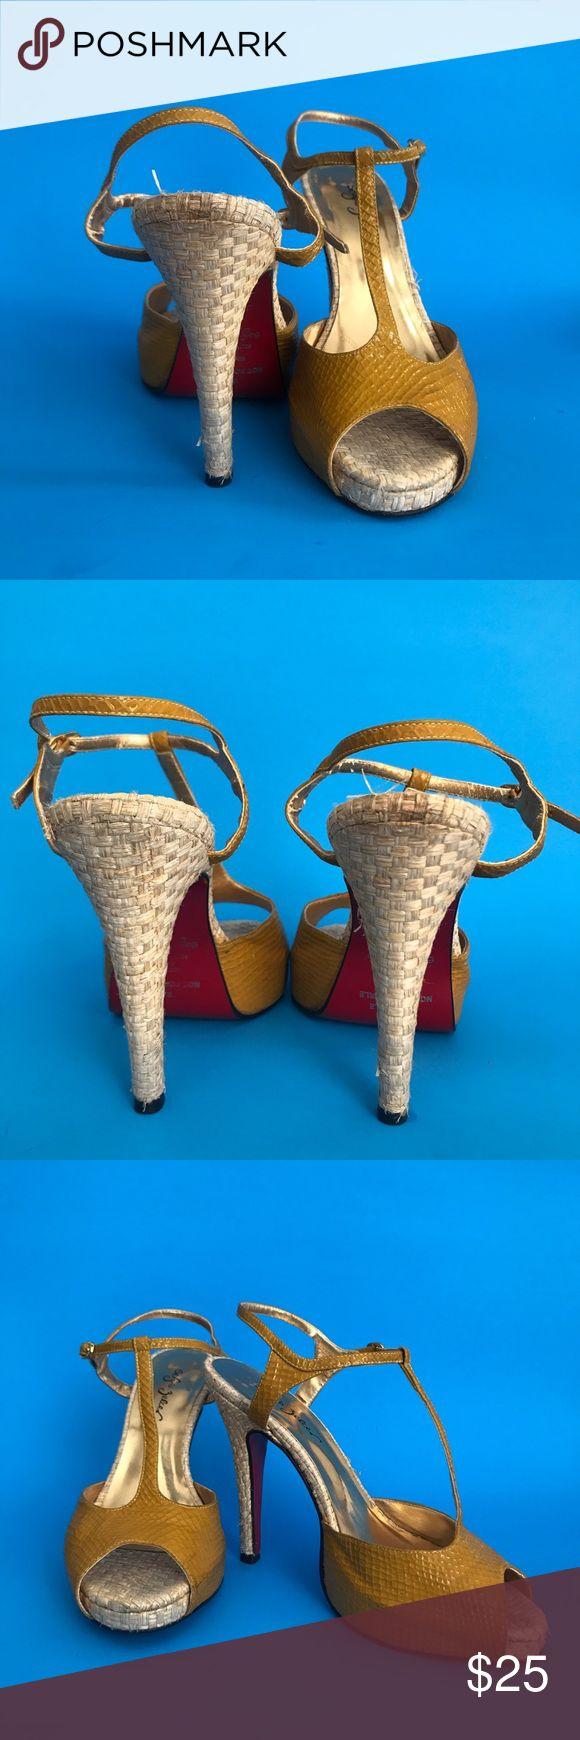 Sergio Zelcer Vintage T Strap Heel Red Soles Sergio Zelcer vintage yellow croc heels with red soles. #tstrap #yellowheels #vintageheels #redsoles #redbottoms #loubutins Sergio Zelcer Shoes Heels